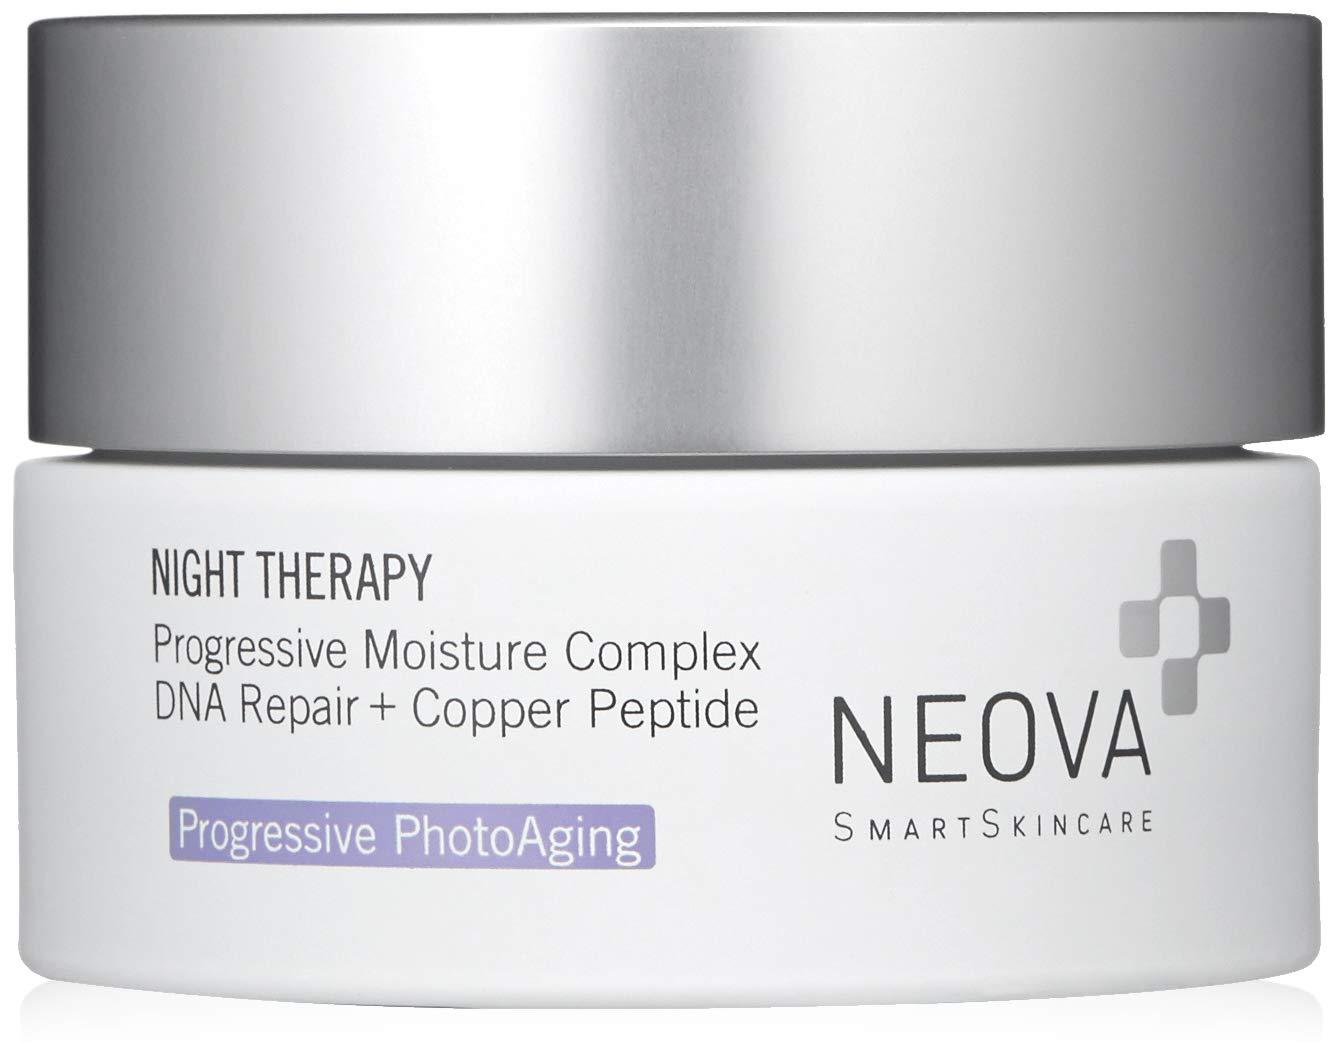 NEOVA Night Therapy, 1.7 Oz